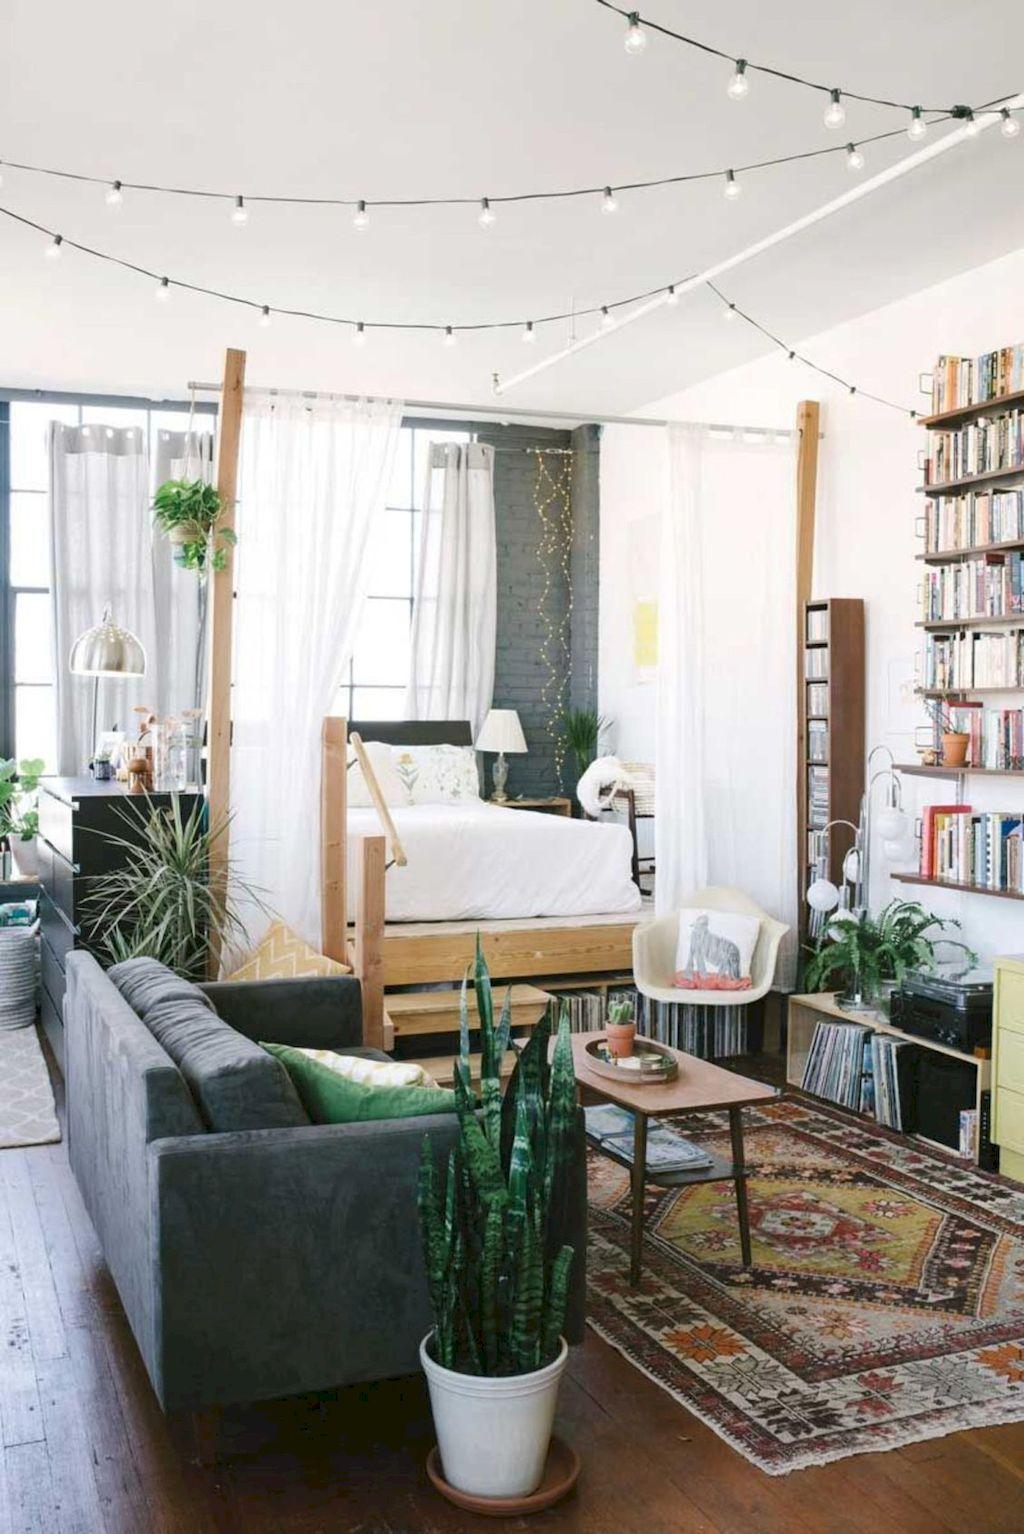 85 Rental Apartment Studio Decor Ideas | Apartments, Small ...